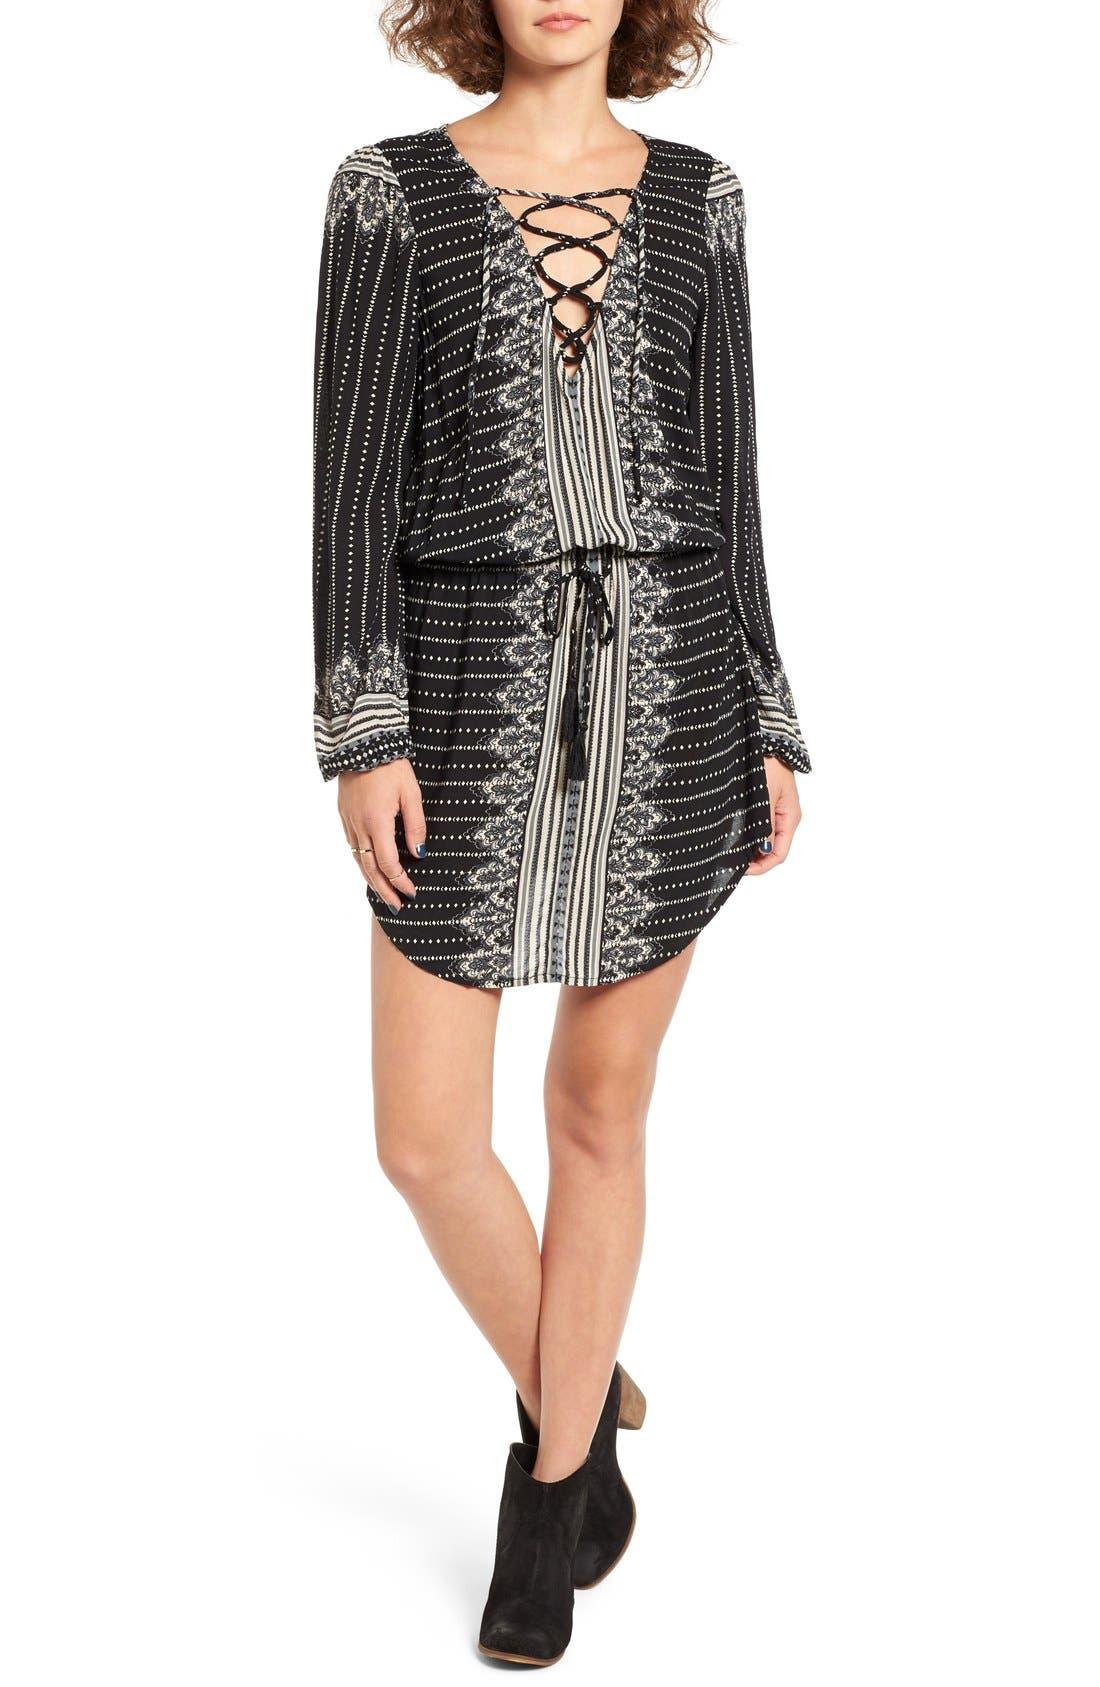 Main Image - Rip Curl Winter Bird Print Lace-Up Dress